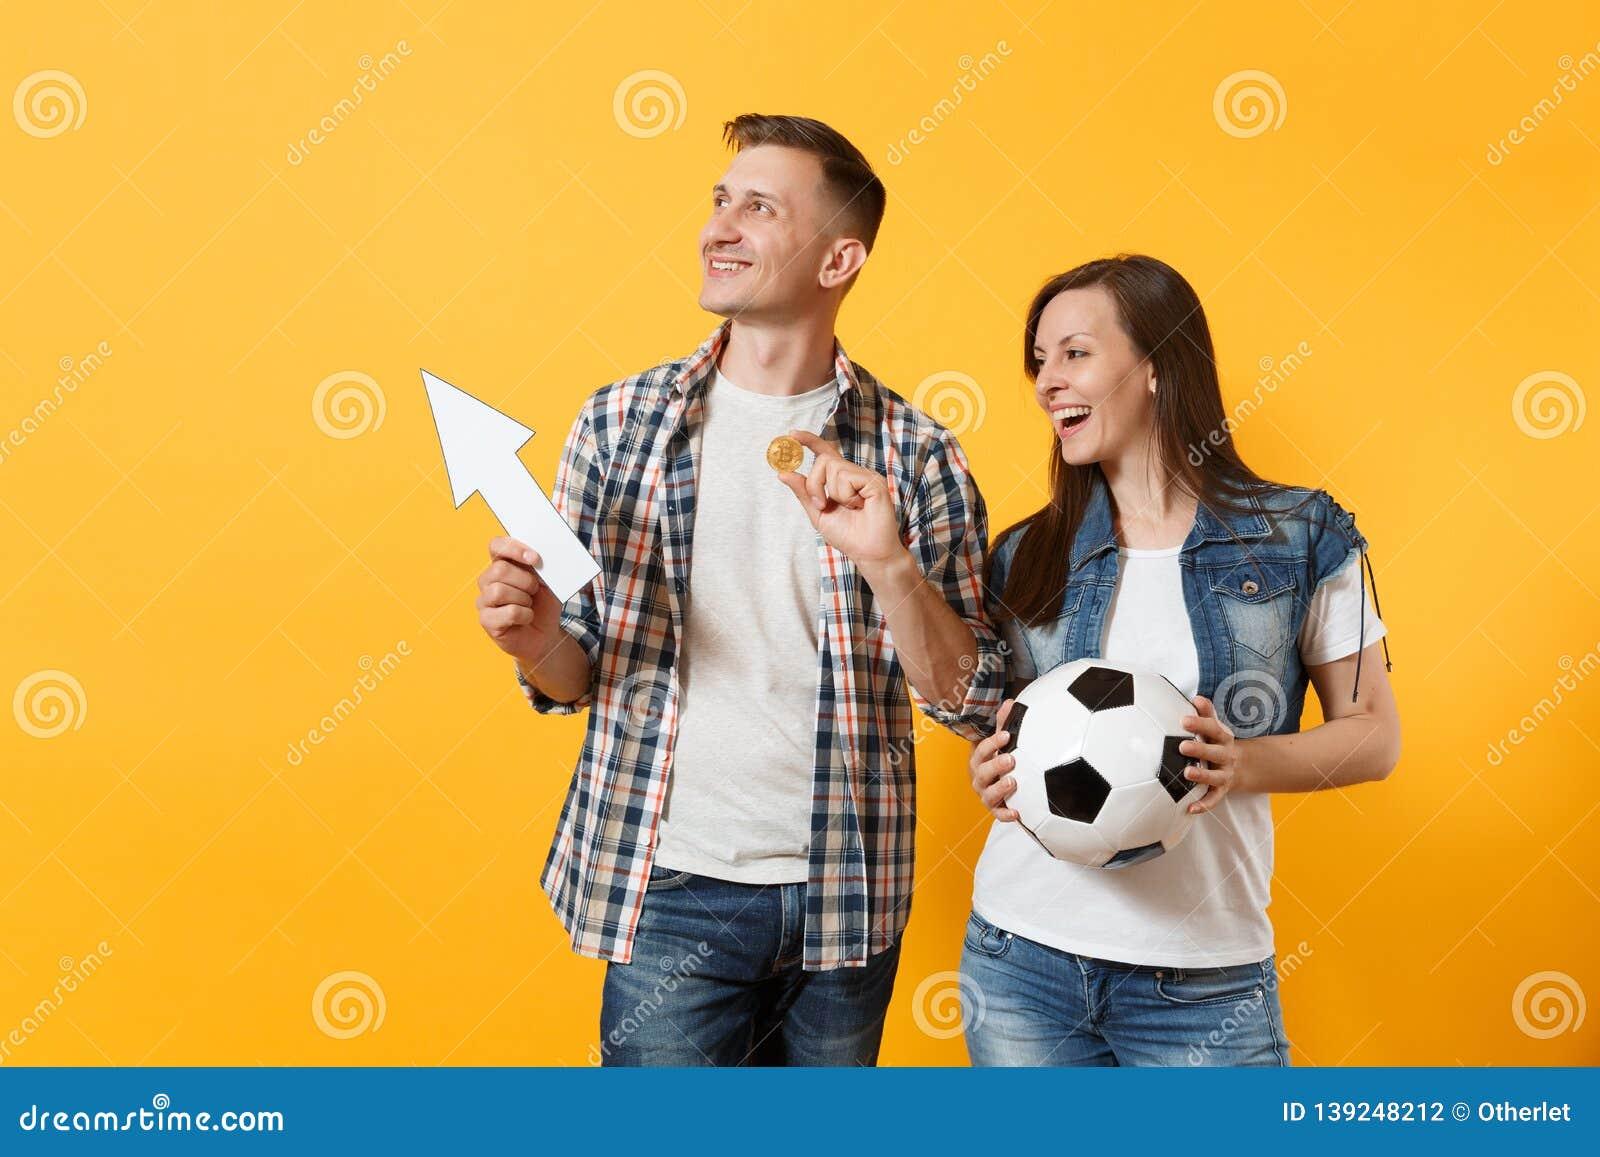 Couple, woman man, football fans holding bitcoin, metal golden coin, up arrow, soccer ball, cheer up support team